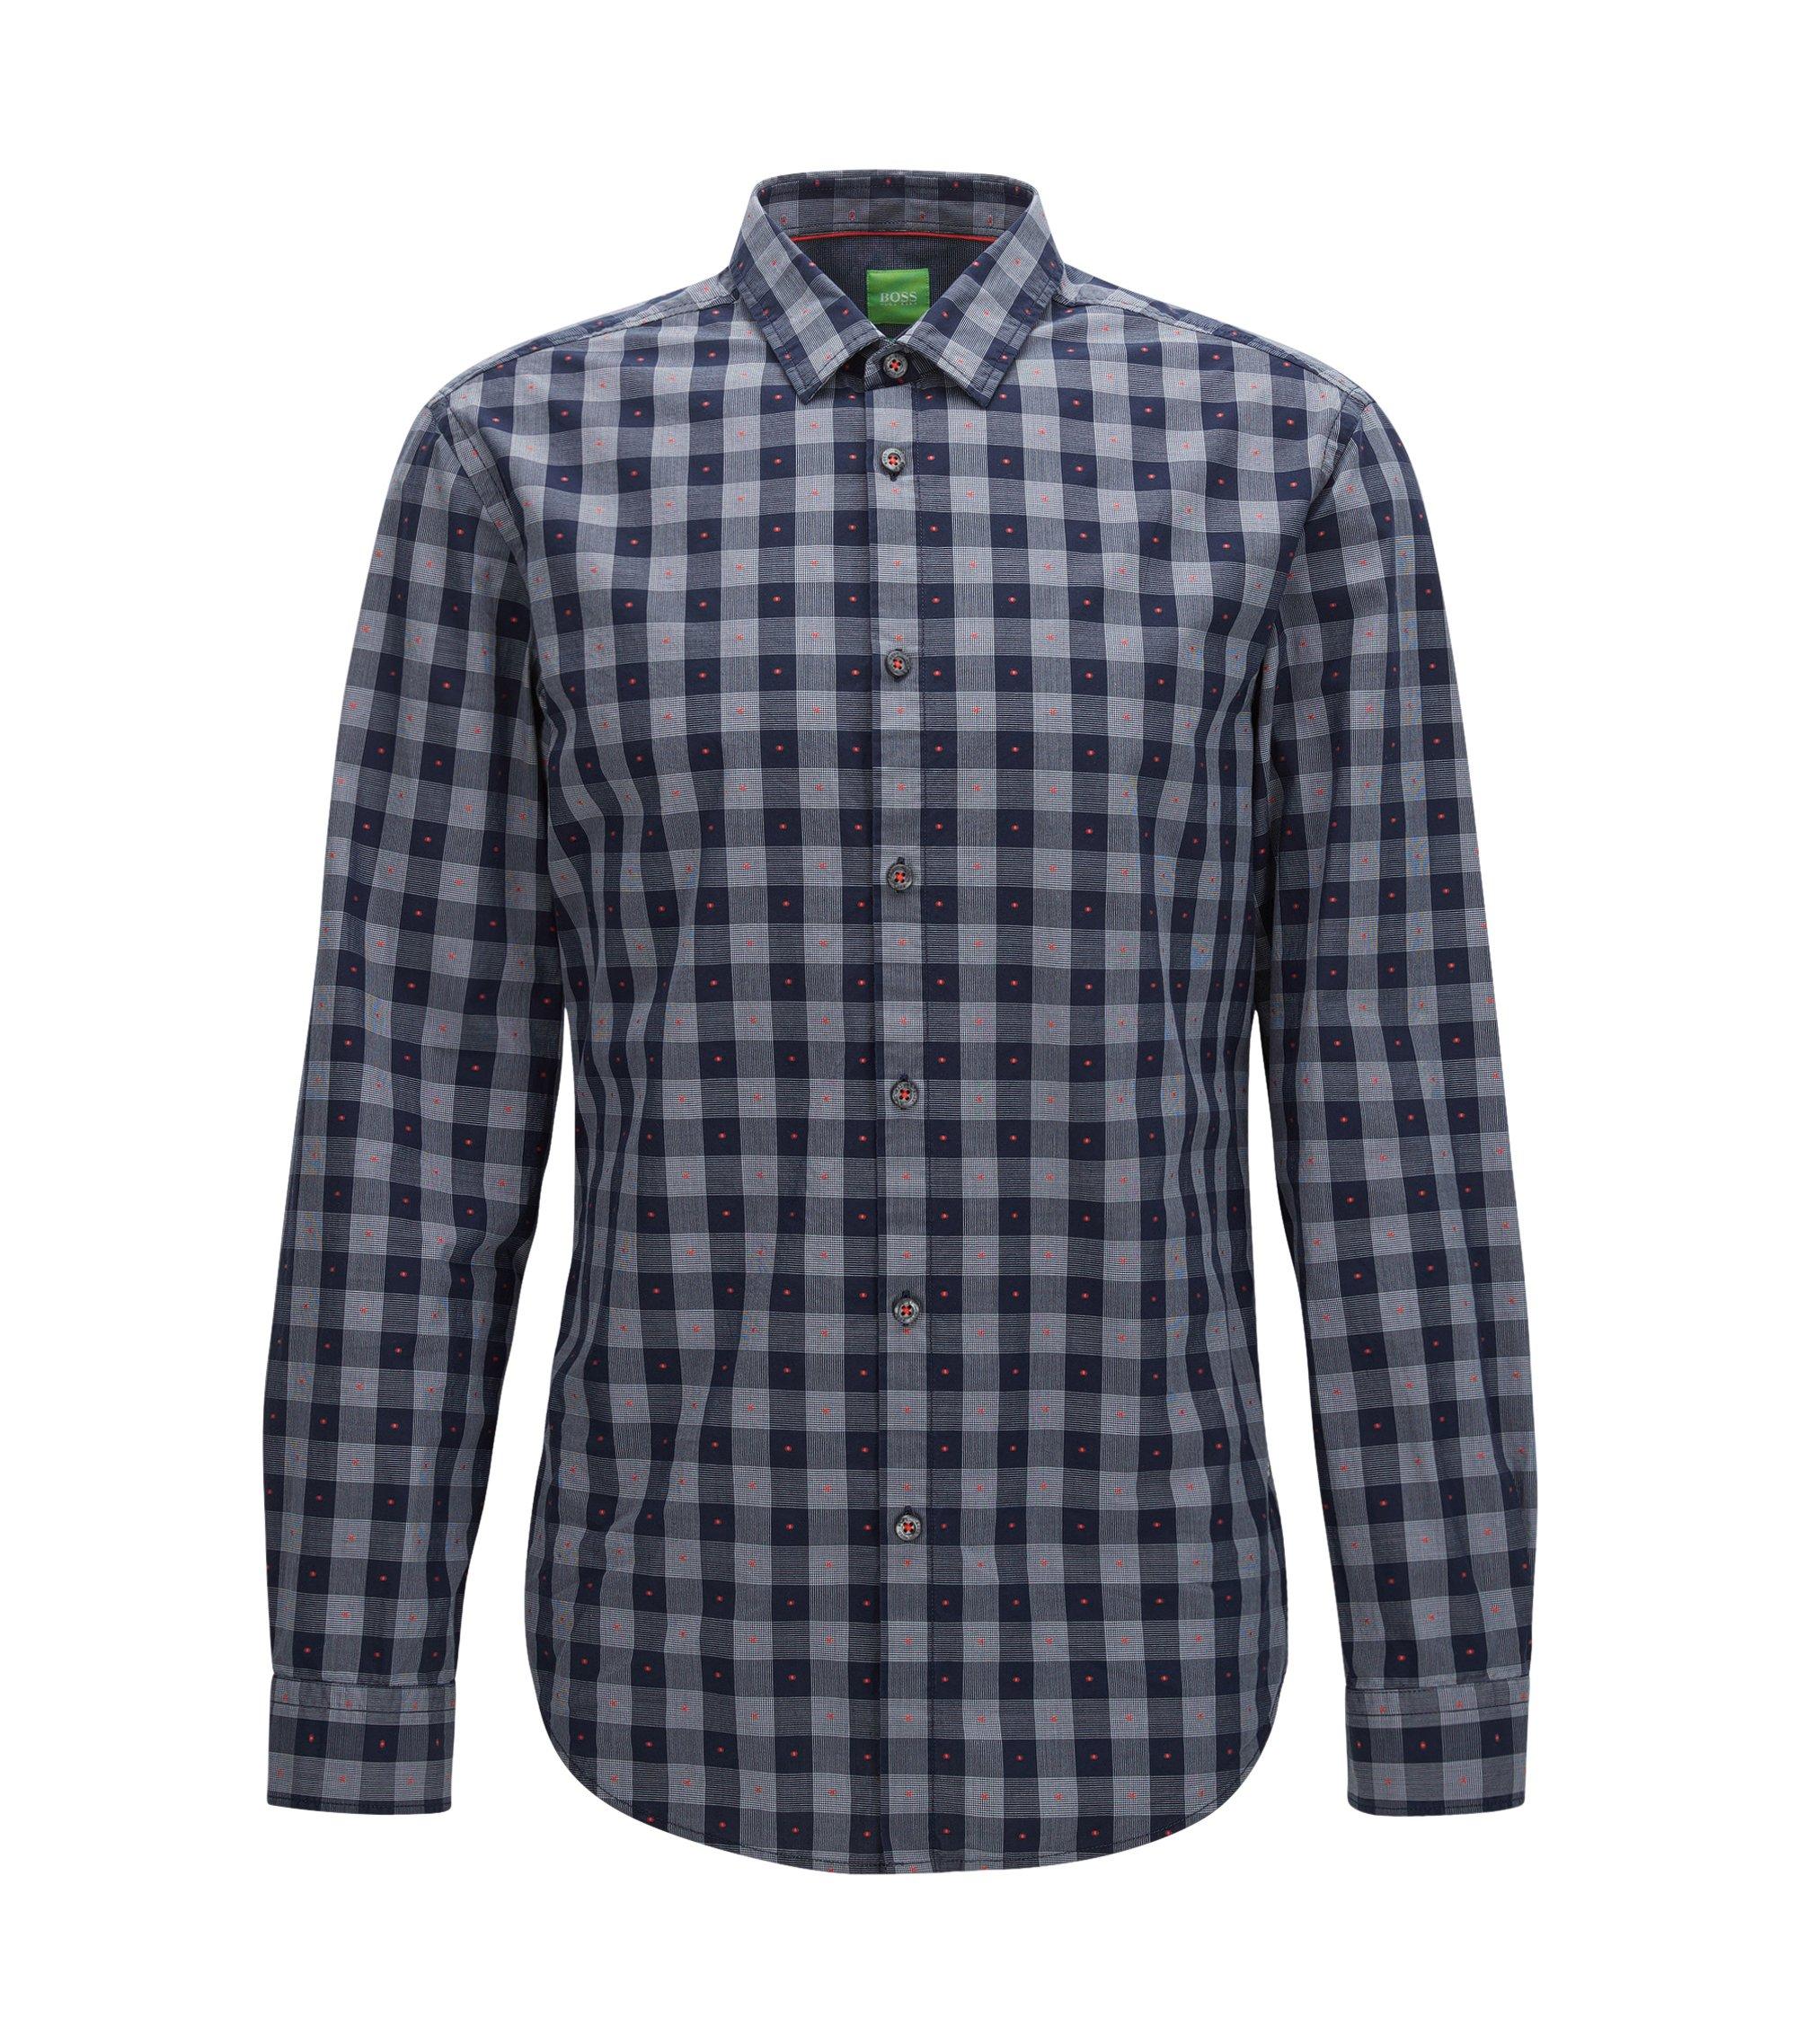 Slim-fit shirt in fil-coupé cotton, Patterned